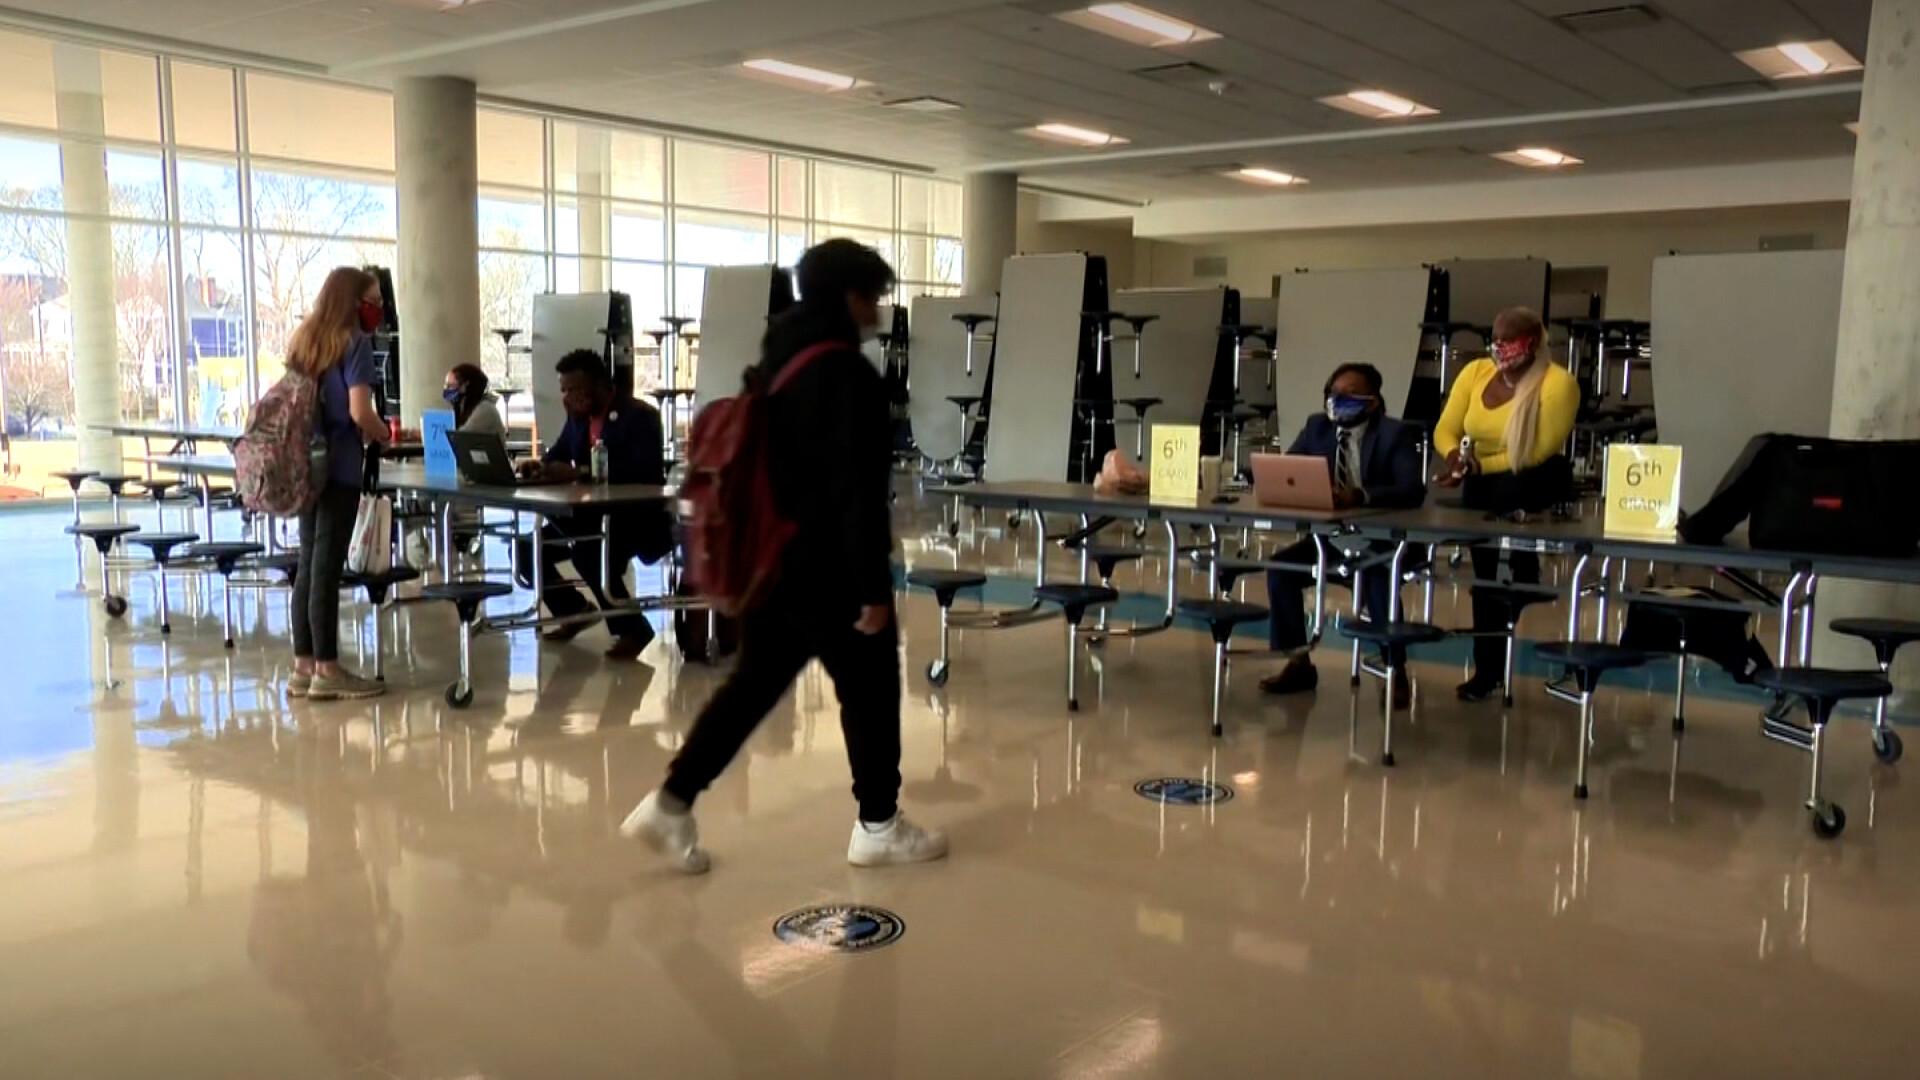 Atlanta students must wear masks when school starts, district says